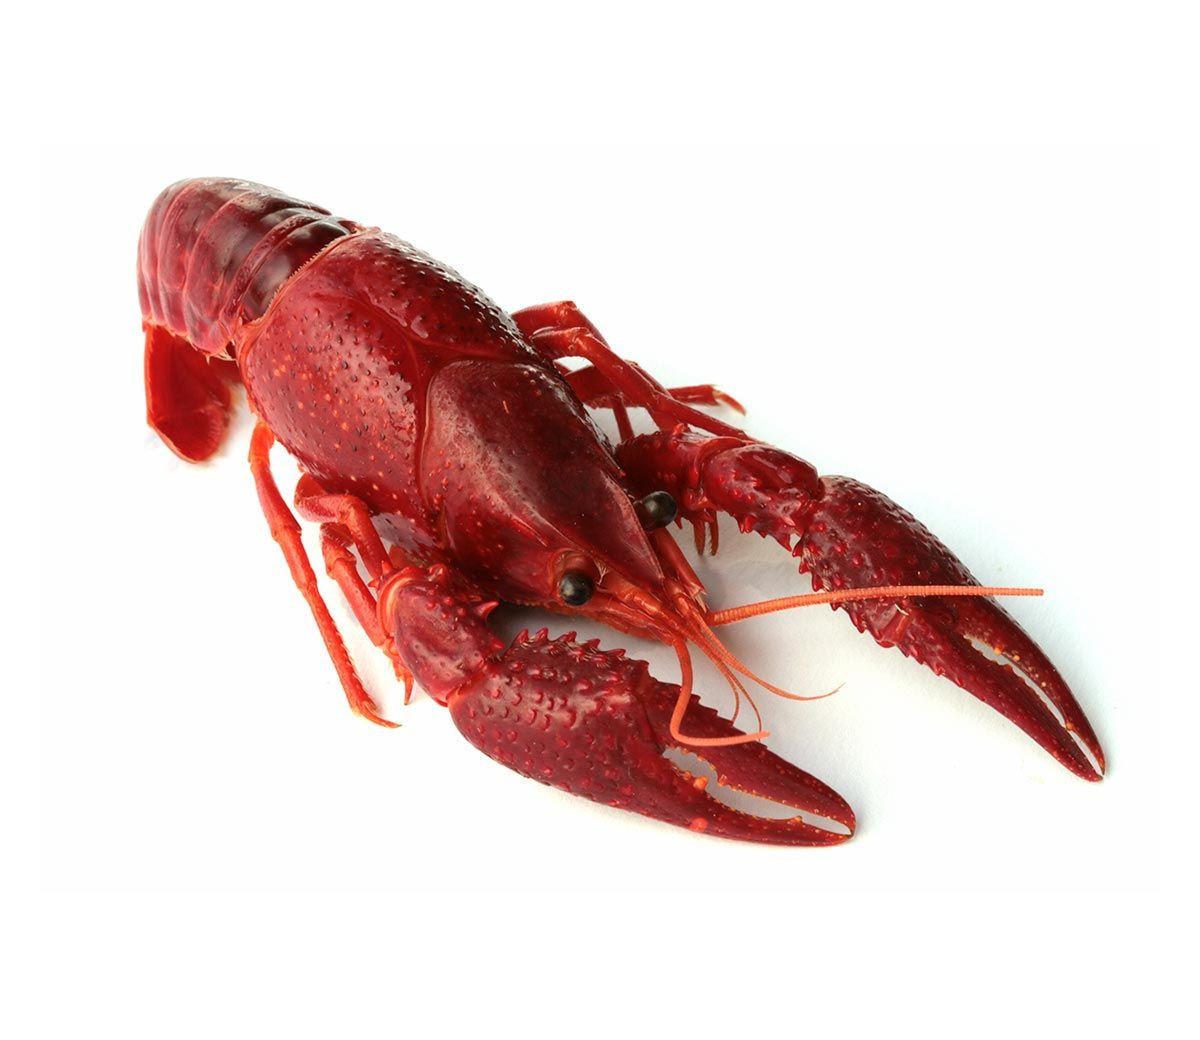 Whole Boiled Unseasoned Frozen Egyptian Wild Catch Crawfish